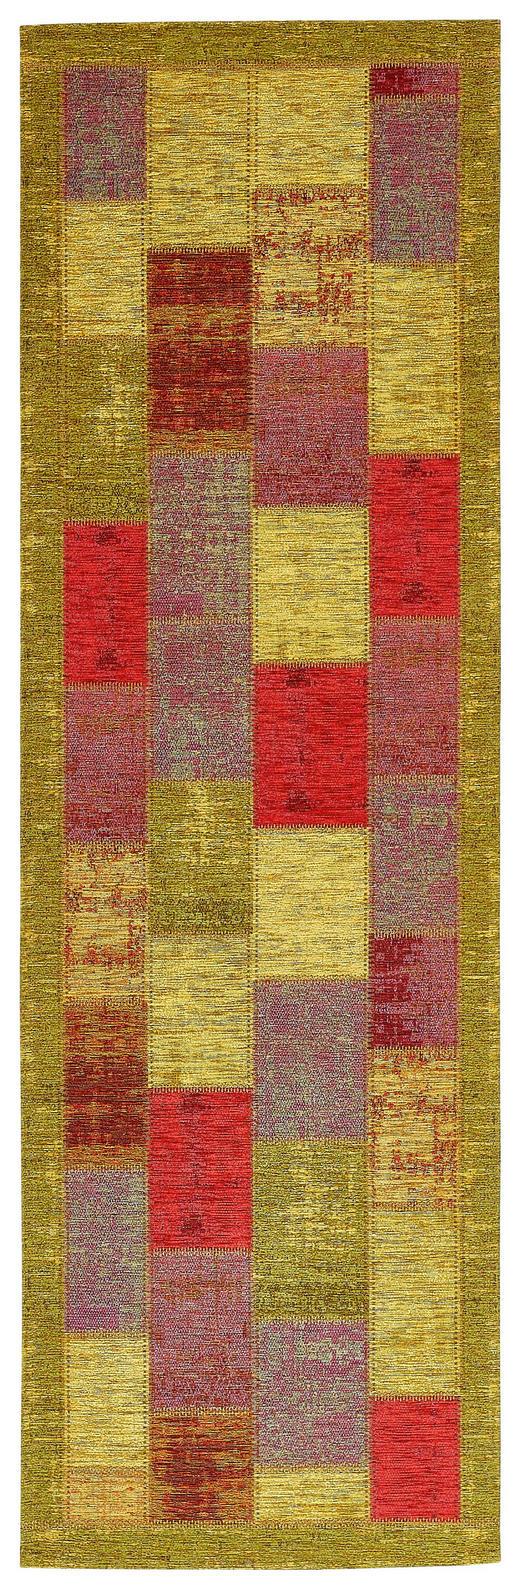 LÄUFER  68/220 cm  Multicolor - Multicolor, Basics, Textil (68/220cm) - Novel